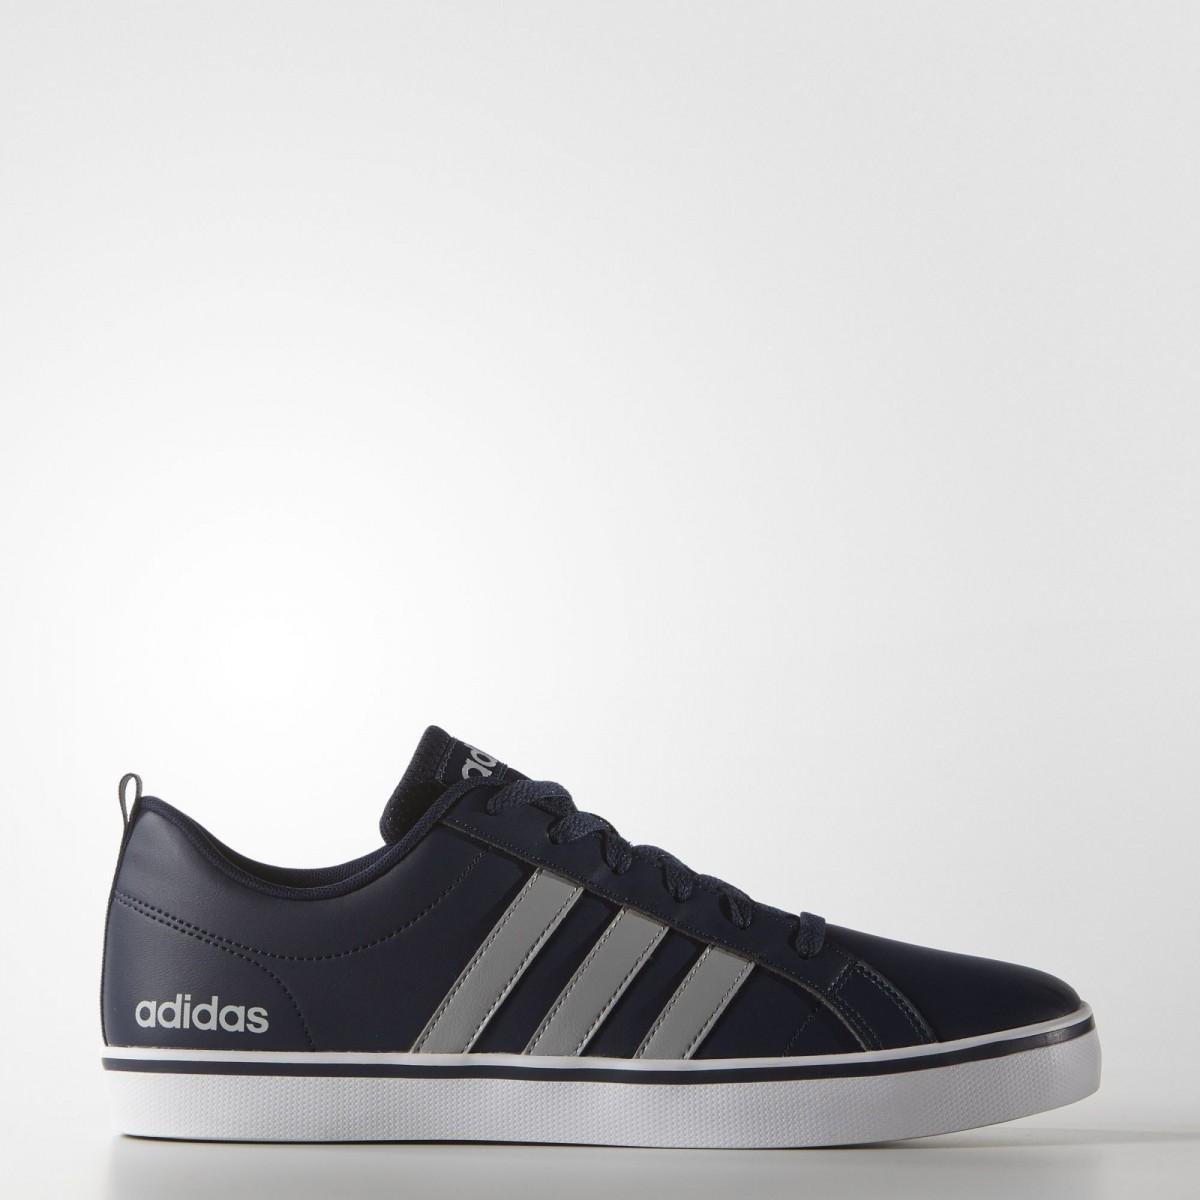 6dcb9788b67 Bizz Store - Tênis Masculino Adidas Pace VS Azul Cinza Couro